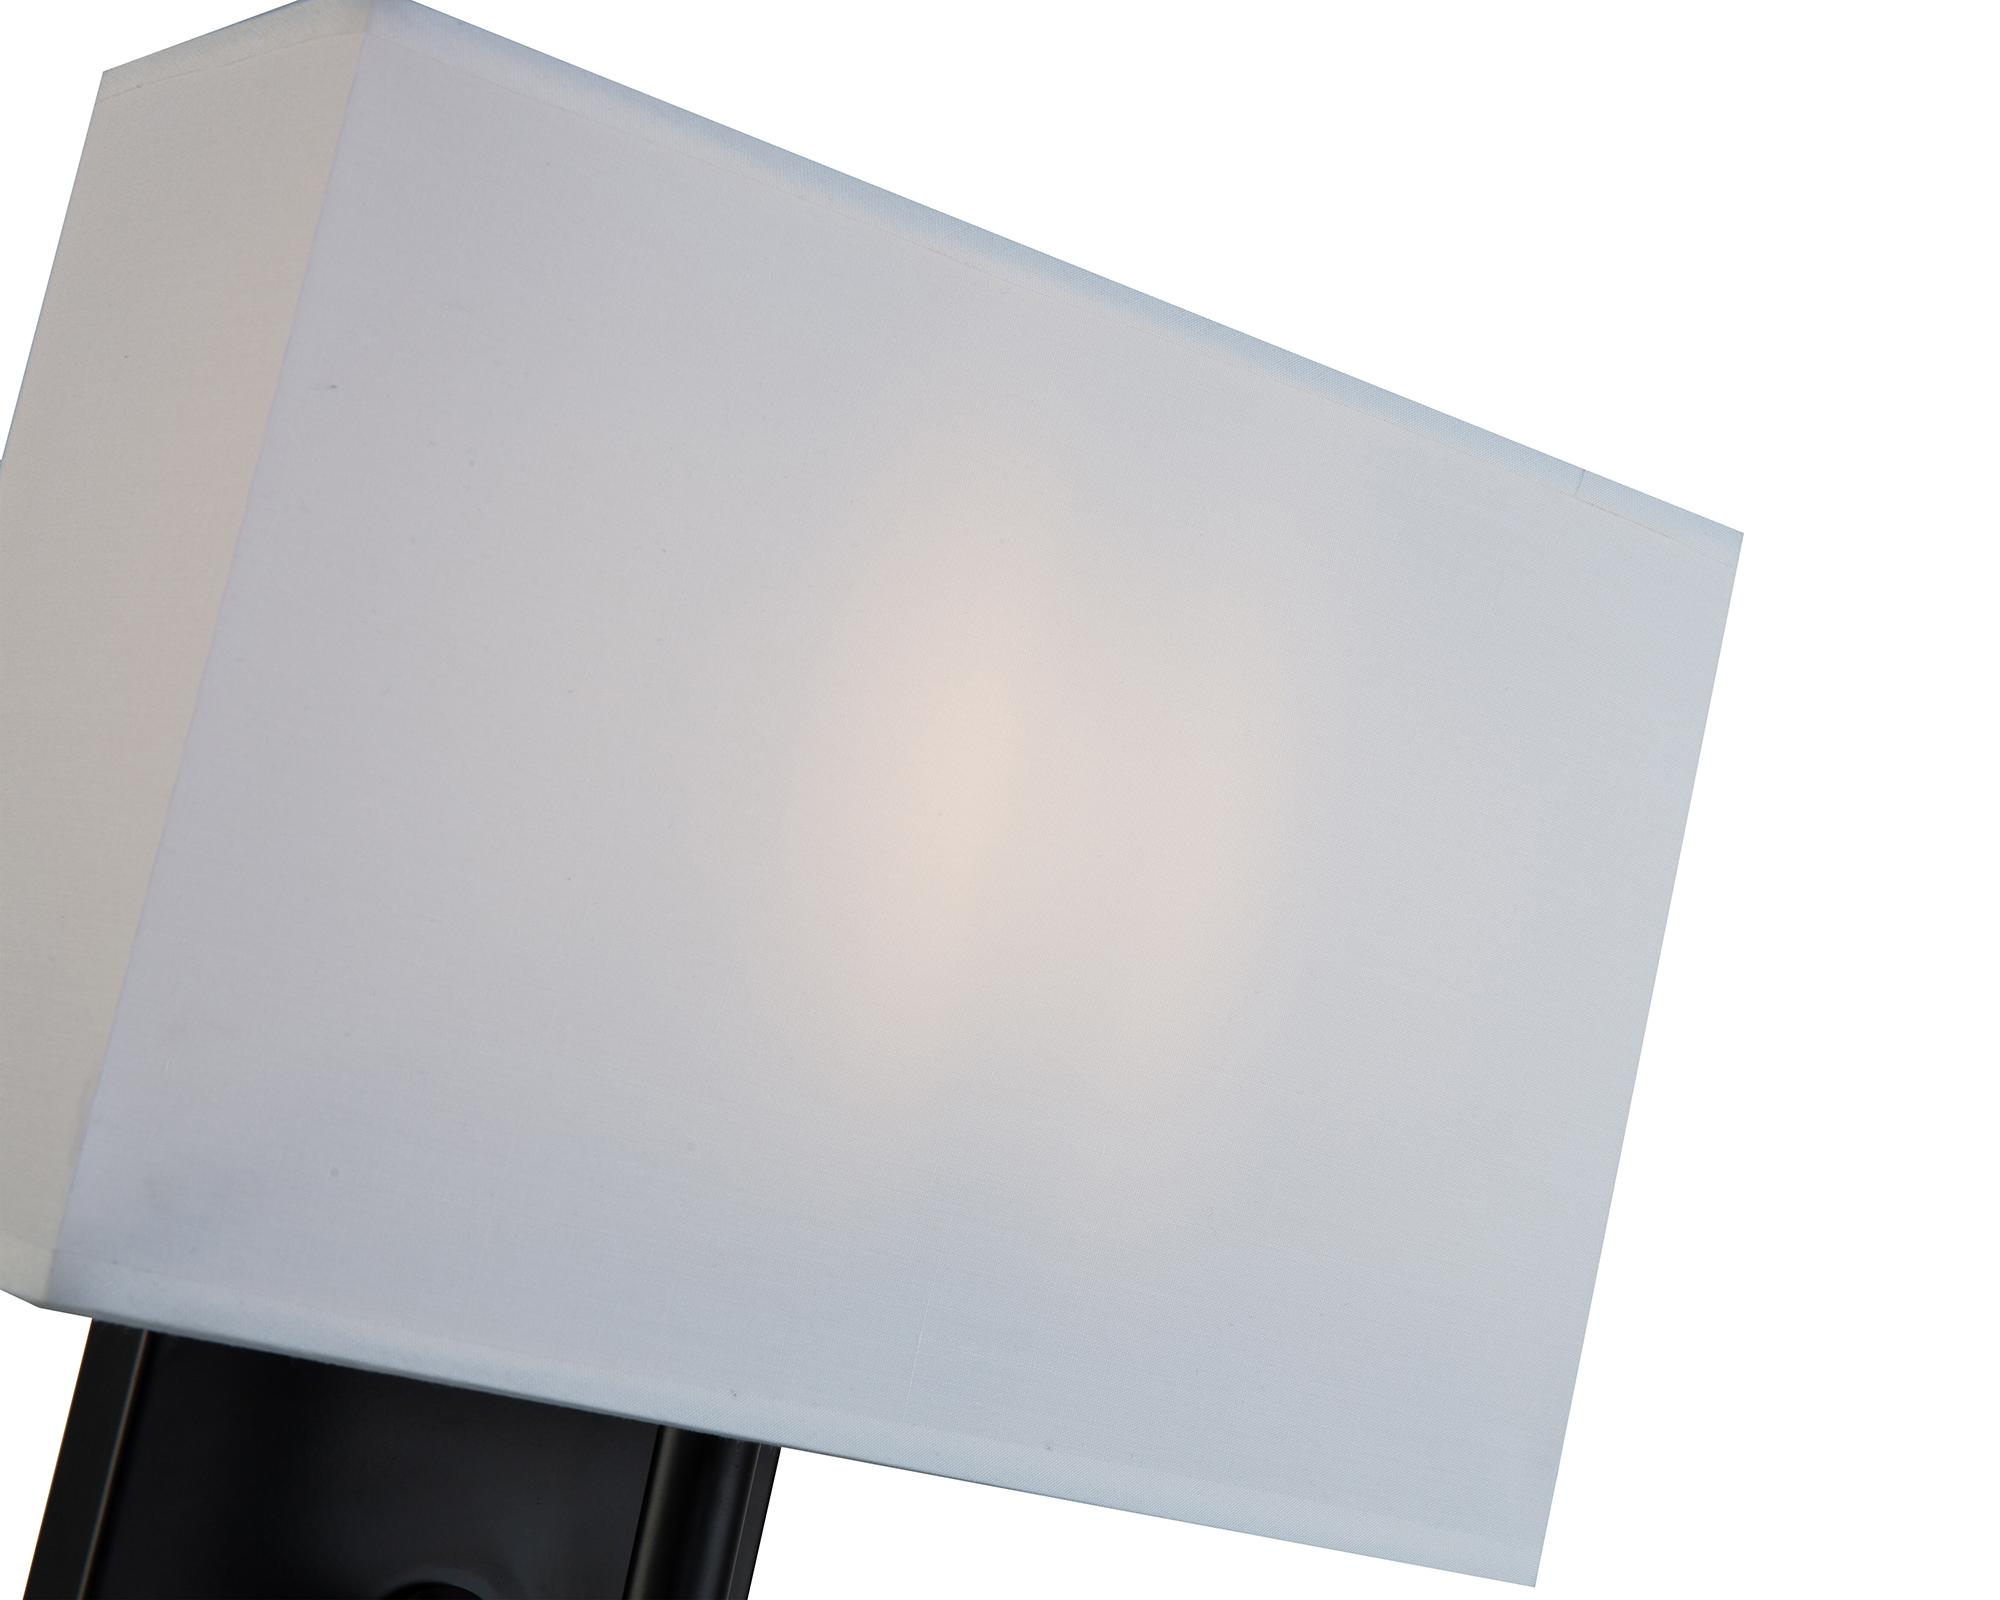 Liang & Eimil KN-LGT-0048 Malin Wall Light Singal (1)